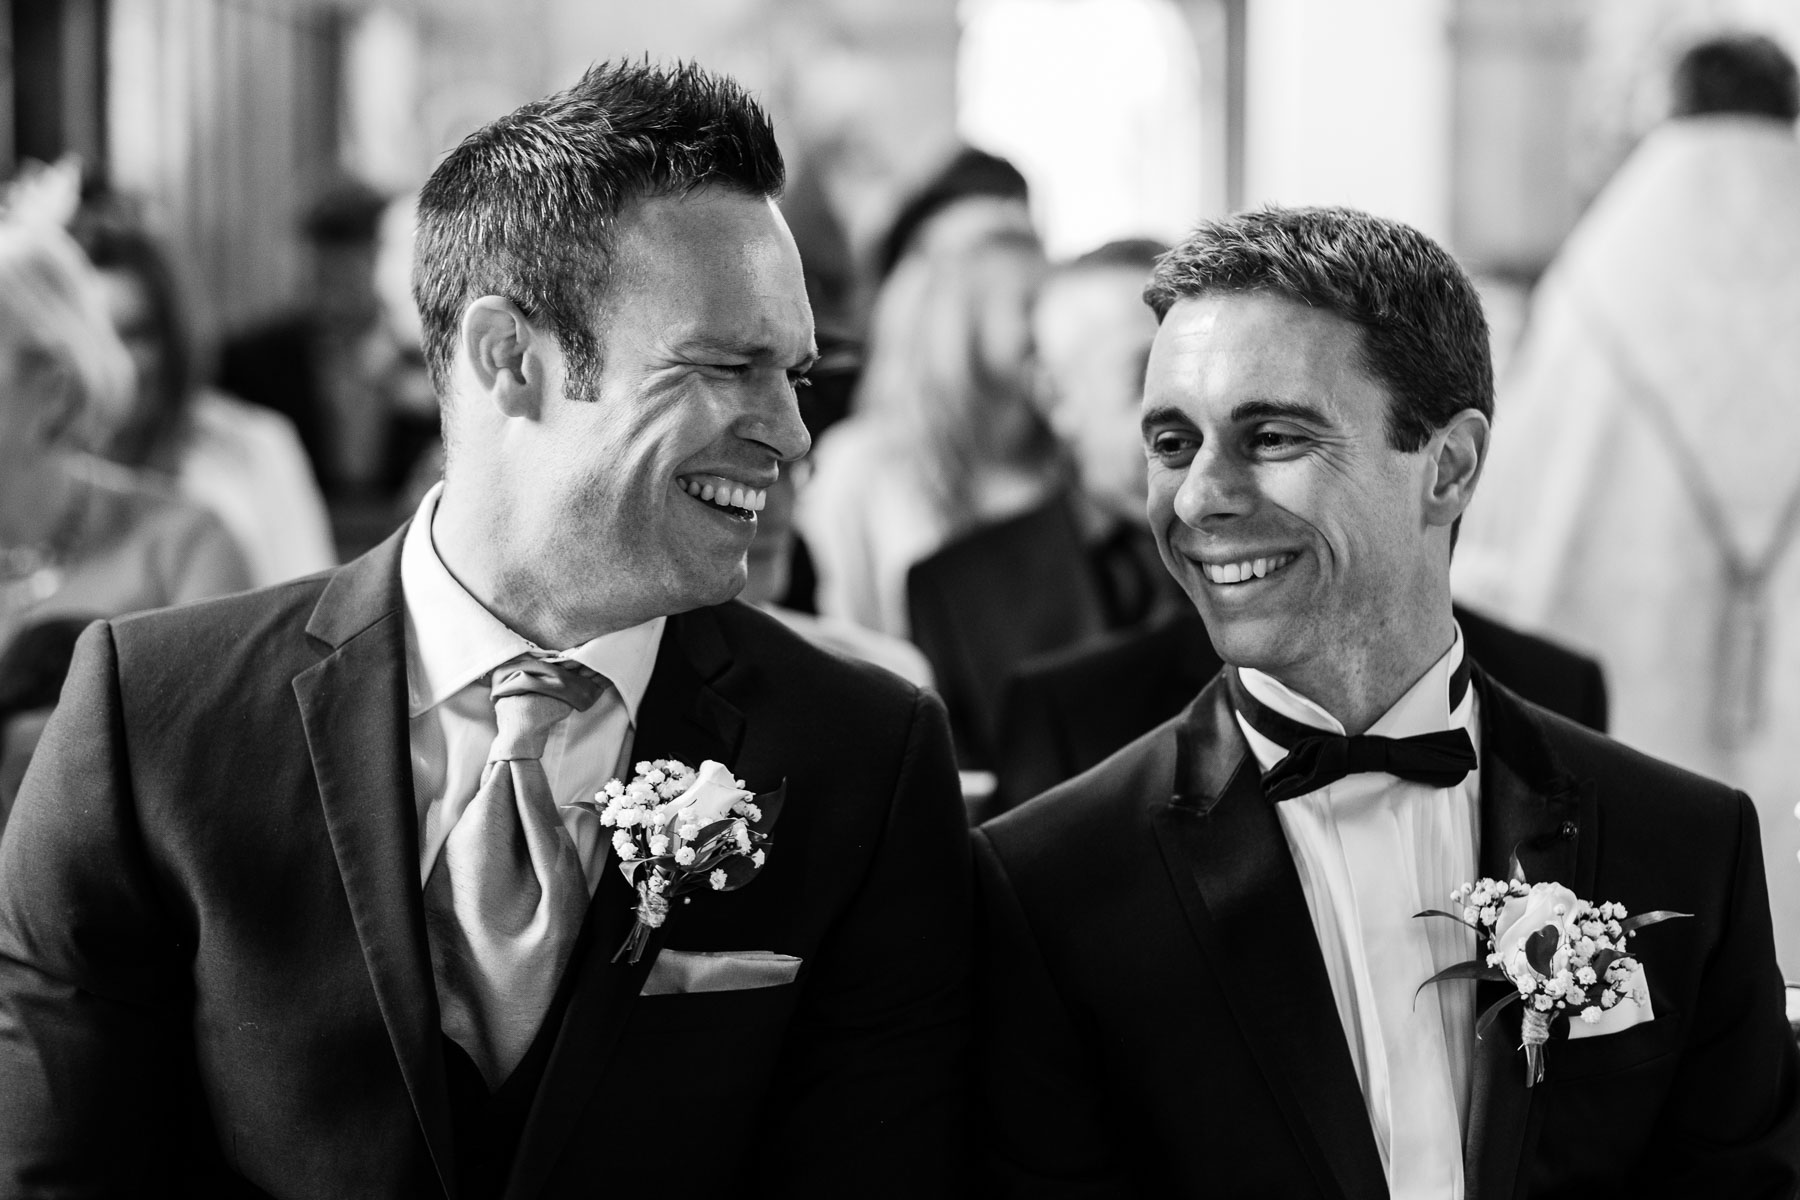 Crathorne Hall Wedding Photography - Jo & Paul (79).jpg